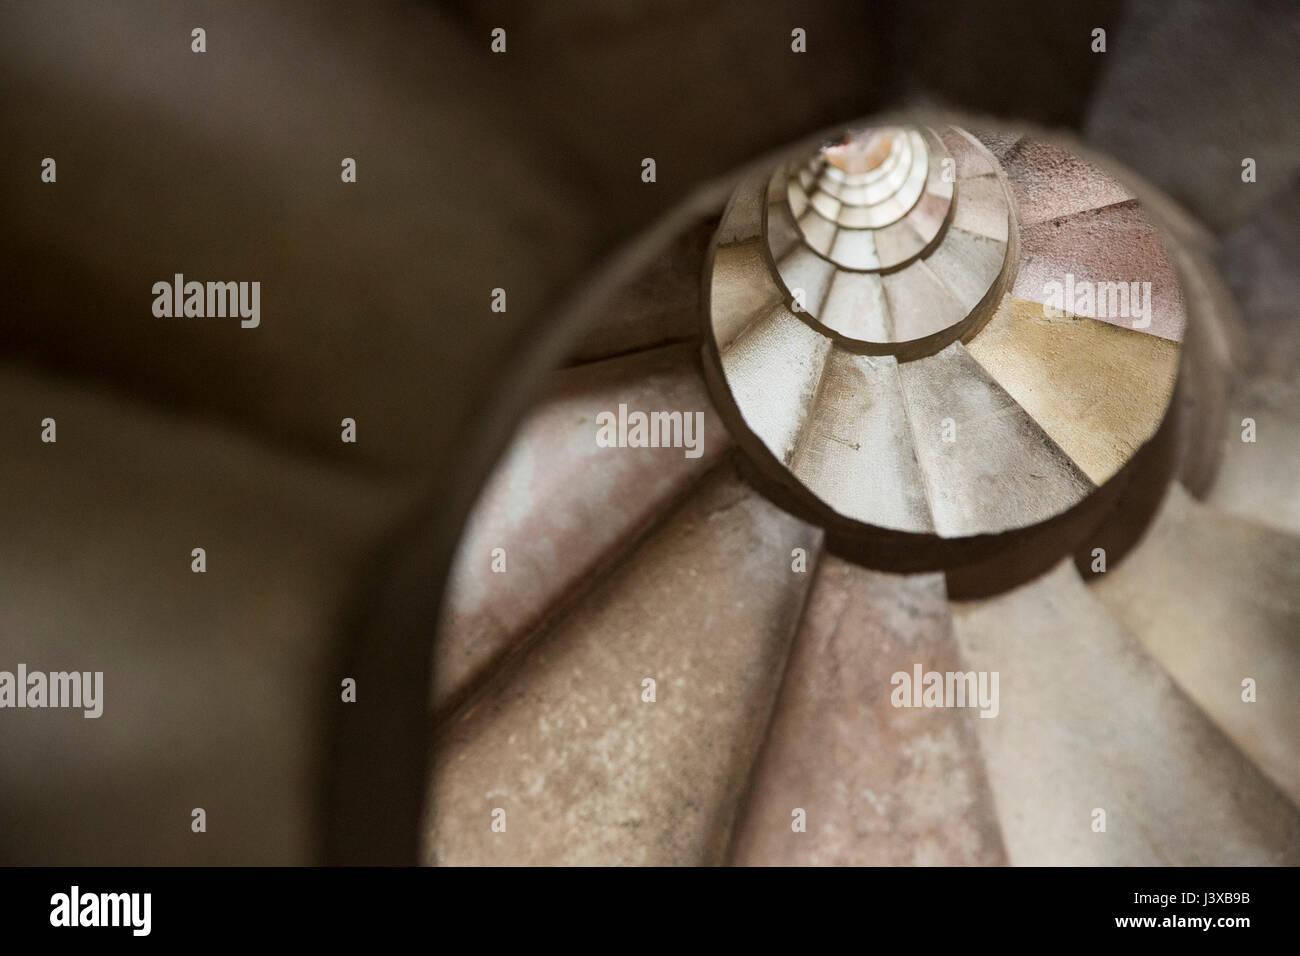 Sagrada Familia, interior view, spiralling staircase, Barcelona, Catalonia, Spain Stock Photo